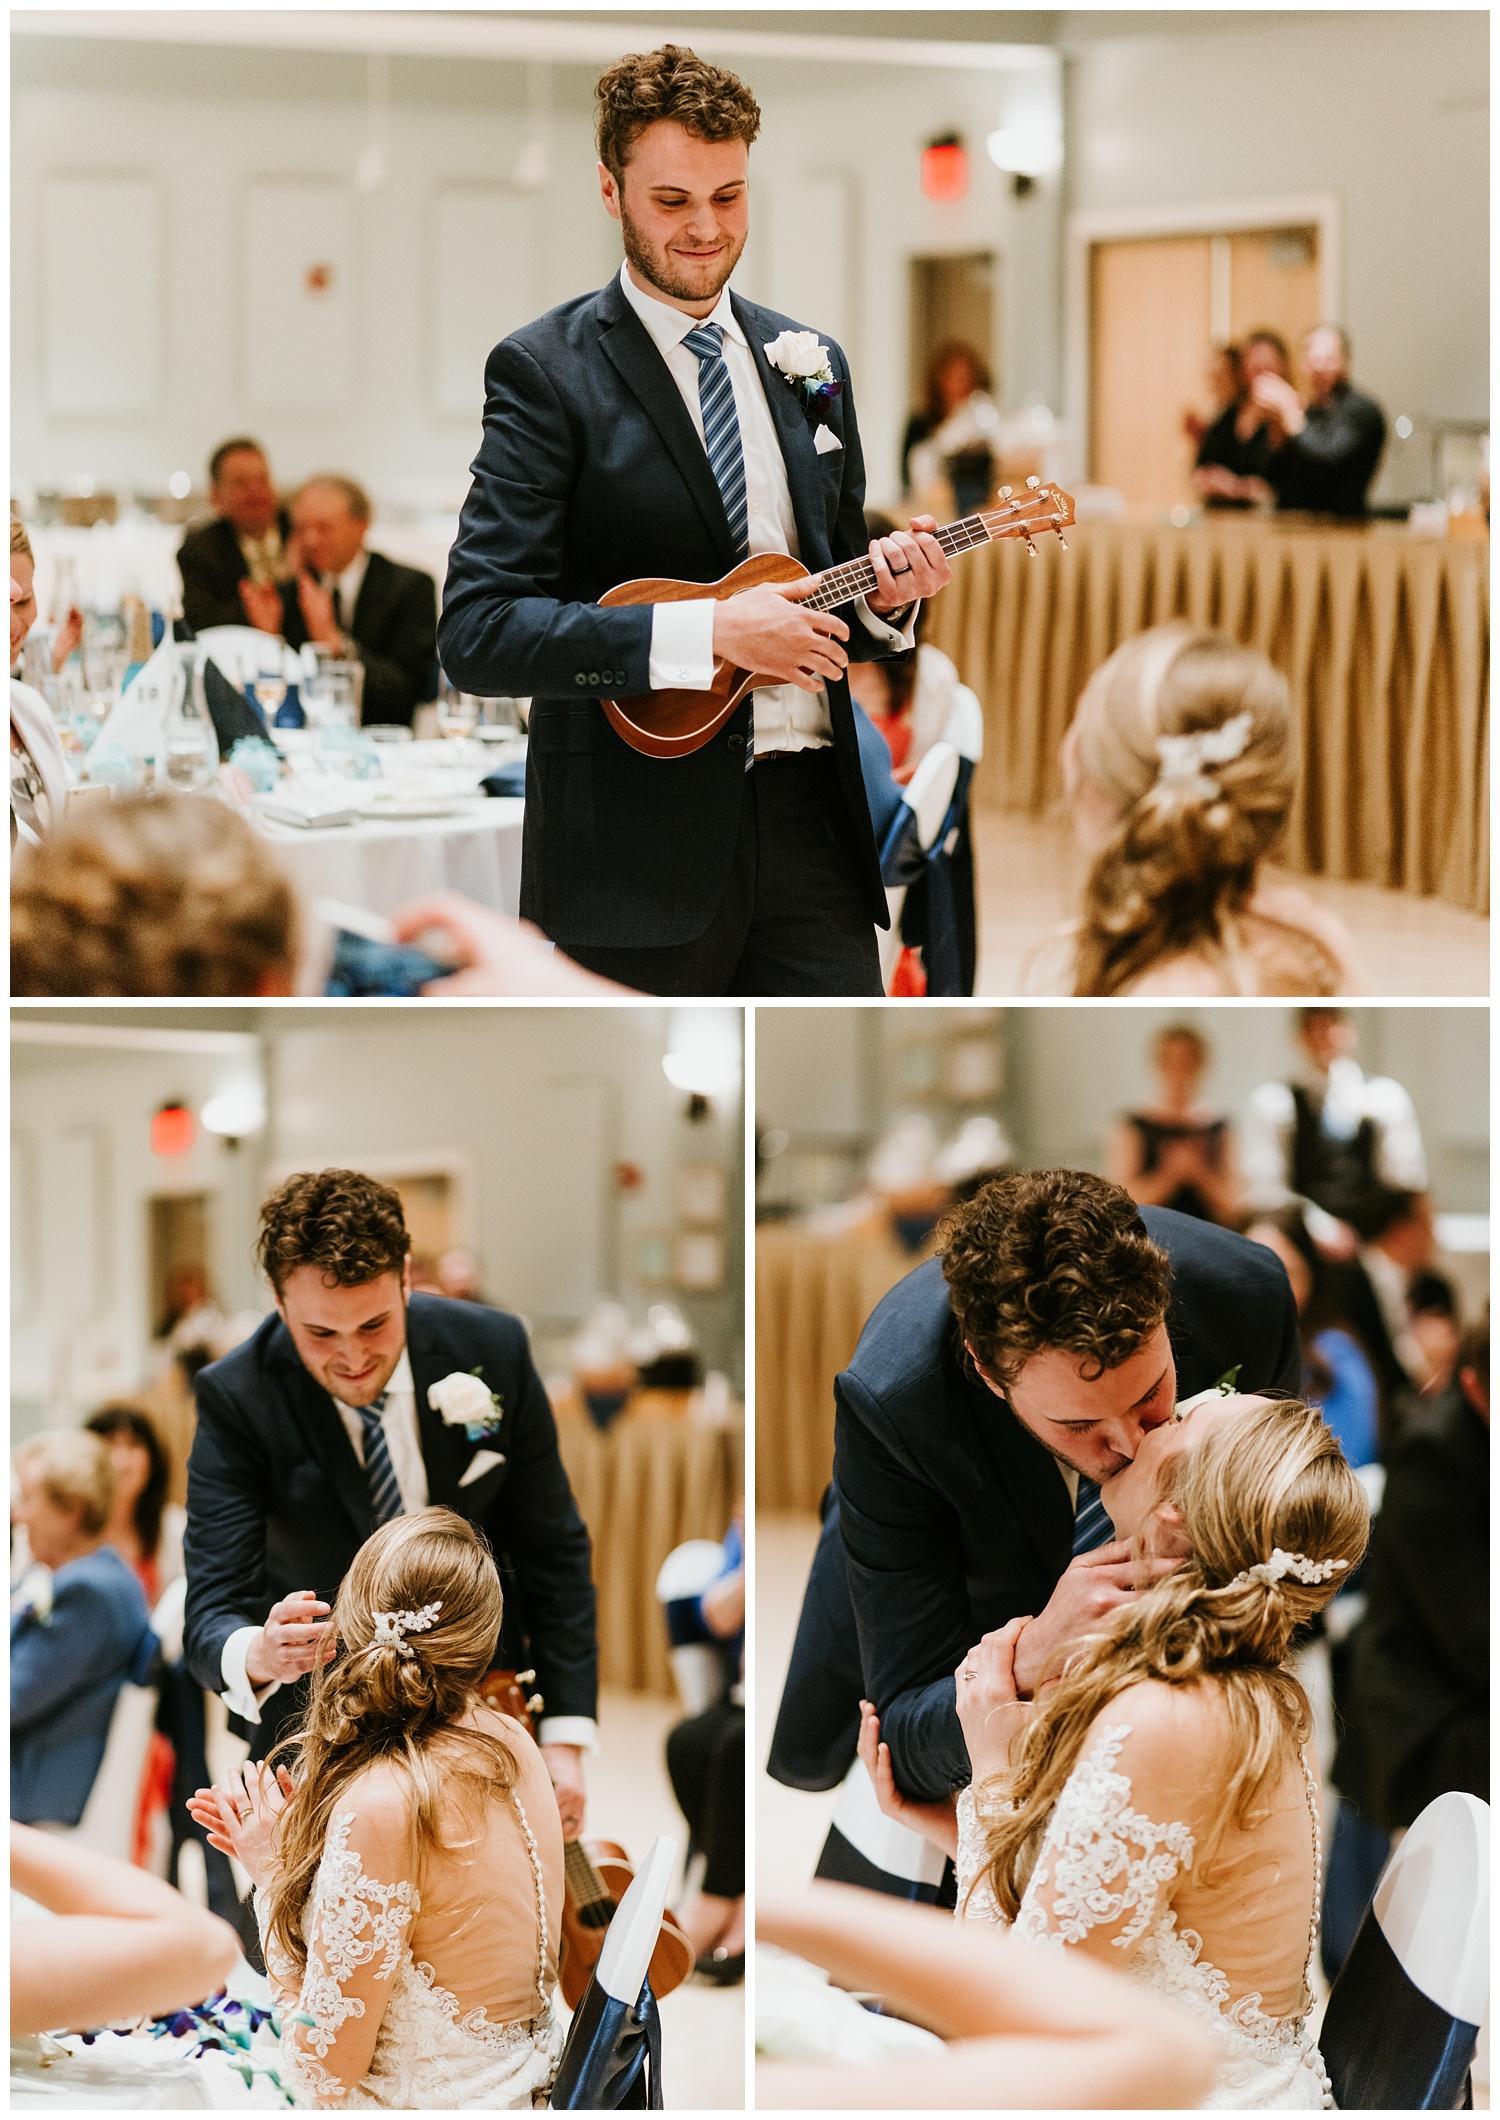 Shadowland Silver Beach St. Joseph Wedding Photographer Rainy Wedding56.jpg